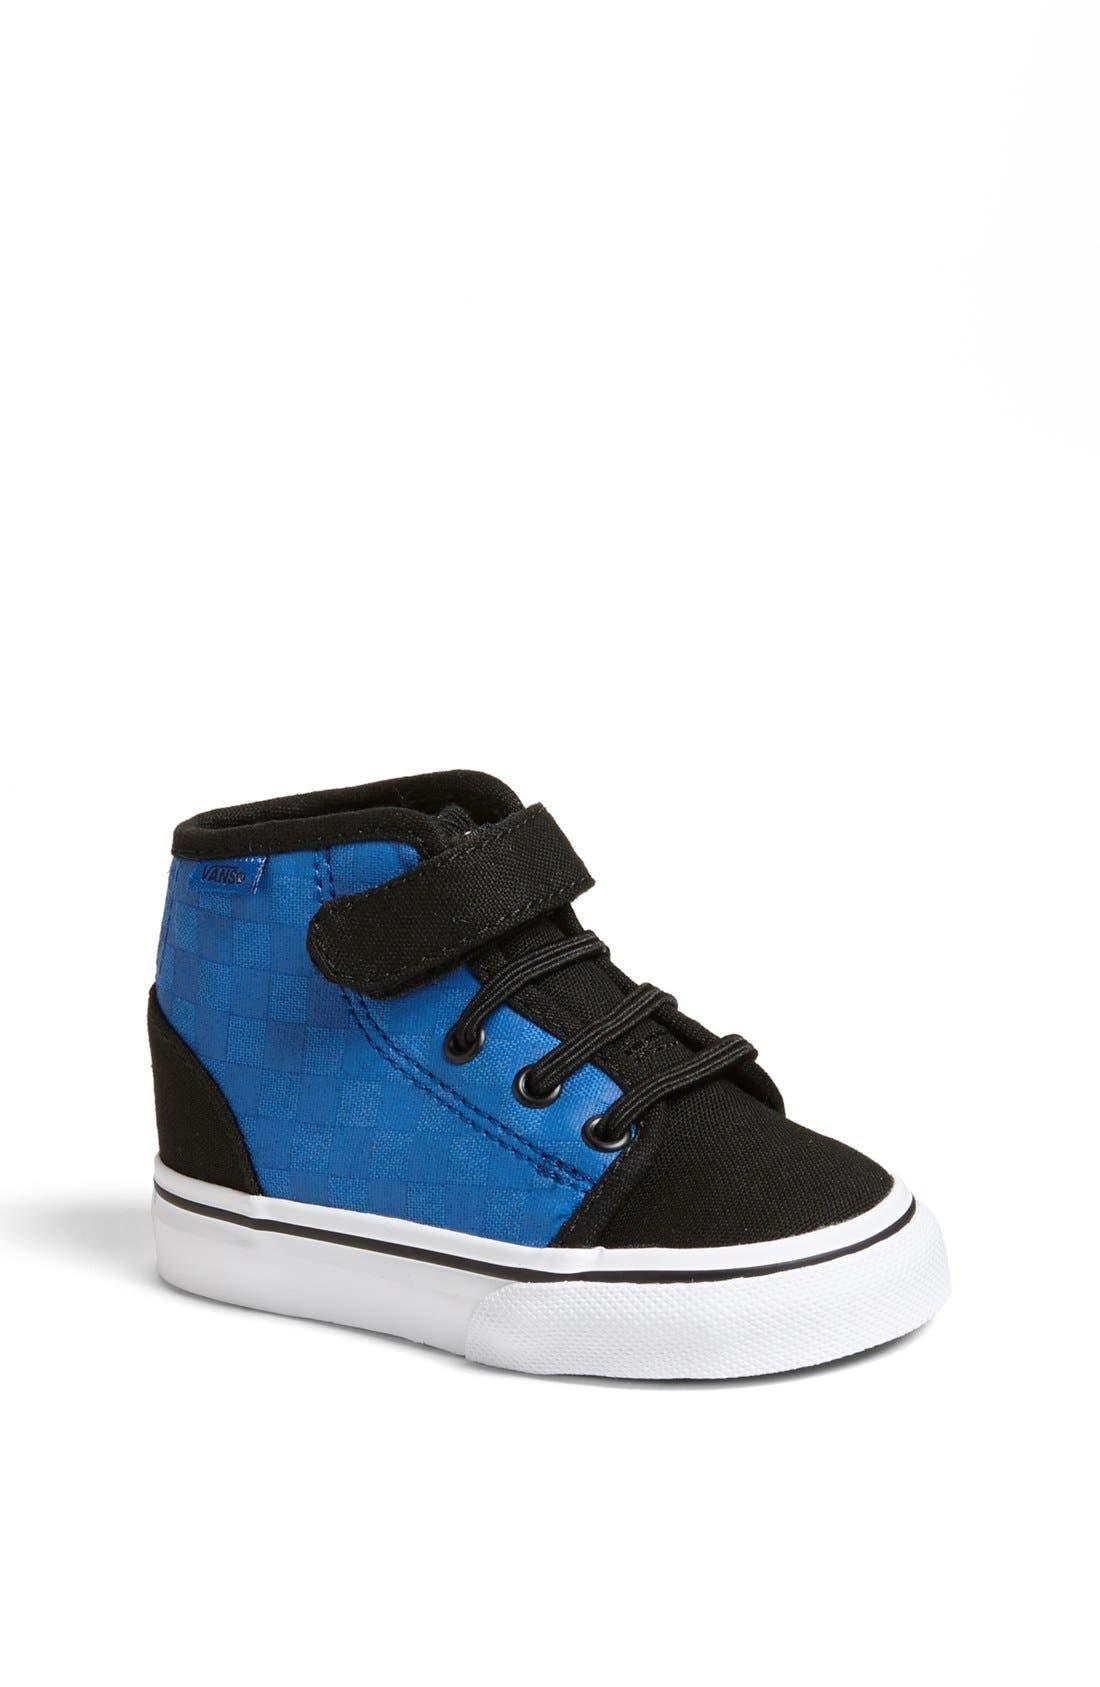 Main Image - Vans High Top Sneaker (Baby, Walker & Toddler)